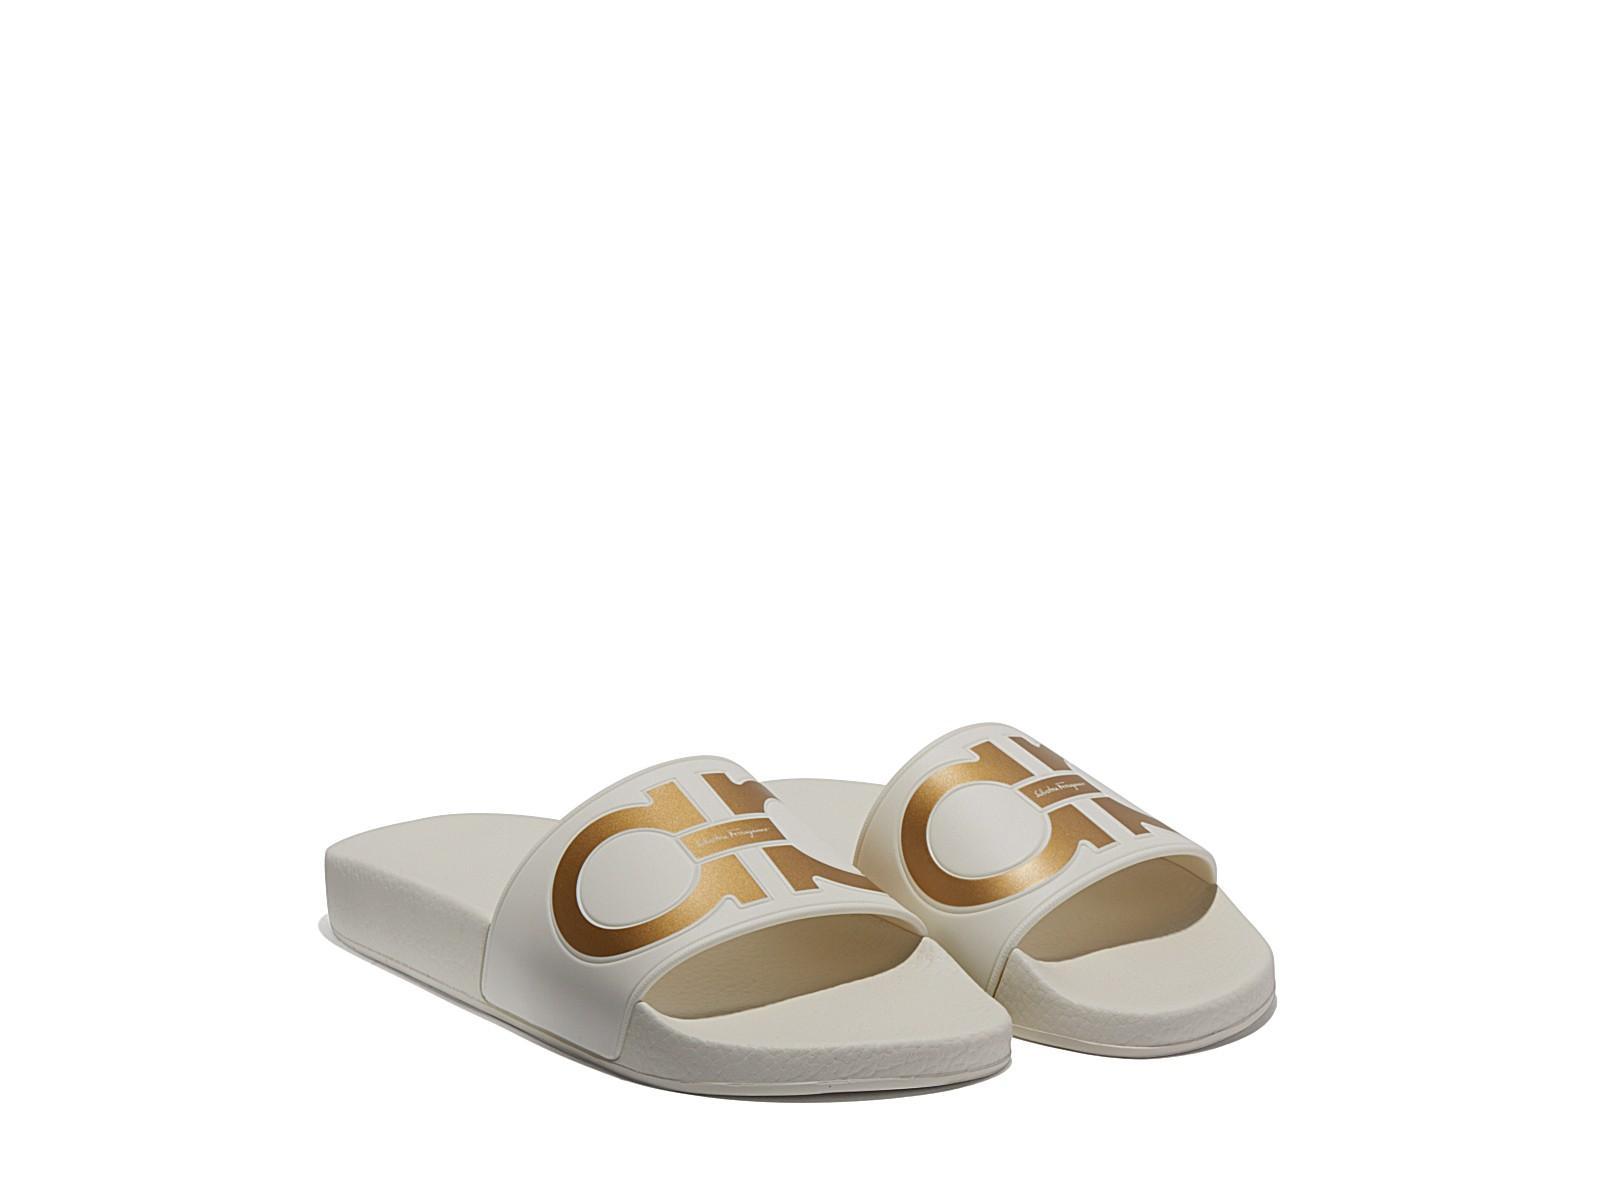 bc9c3c1647a3aa SALVATORE FERRAGAMO. Groove Gancini Flat Slide Sandal